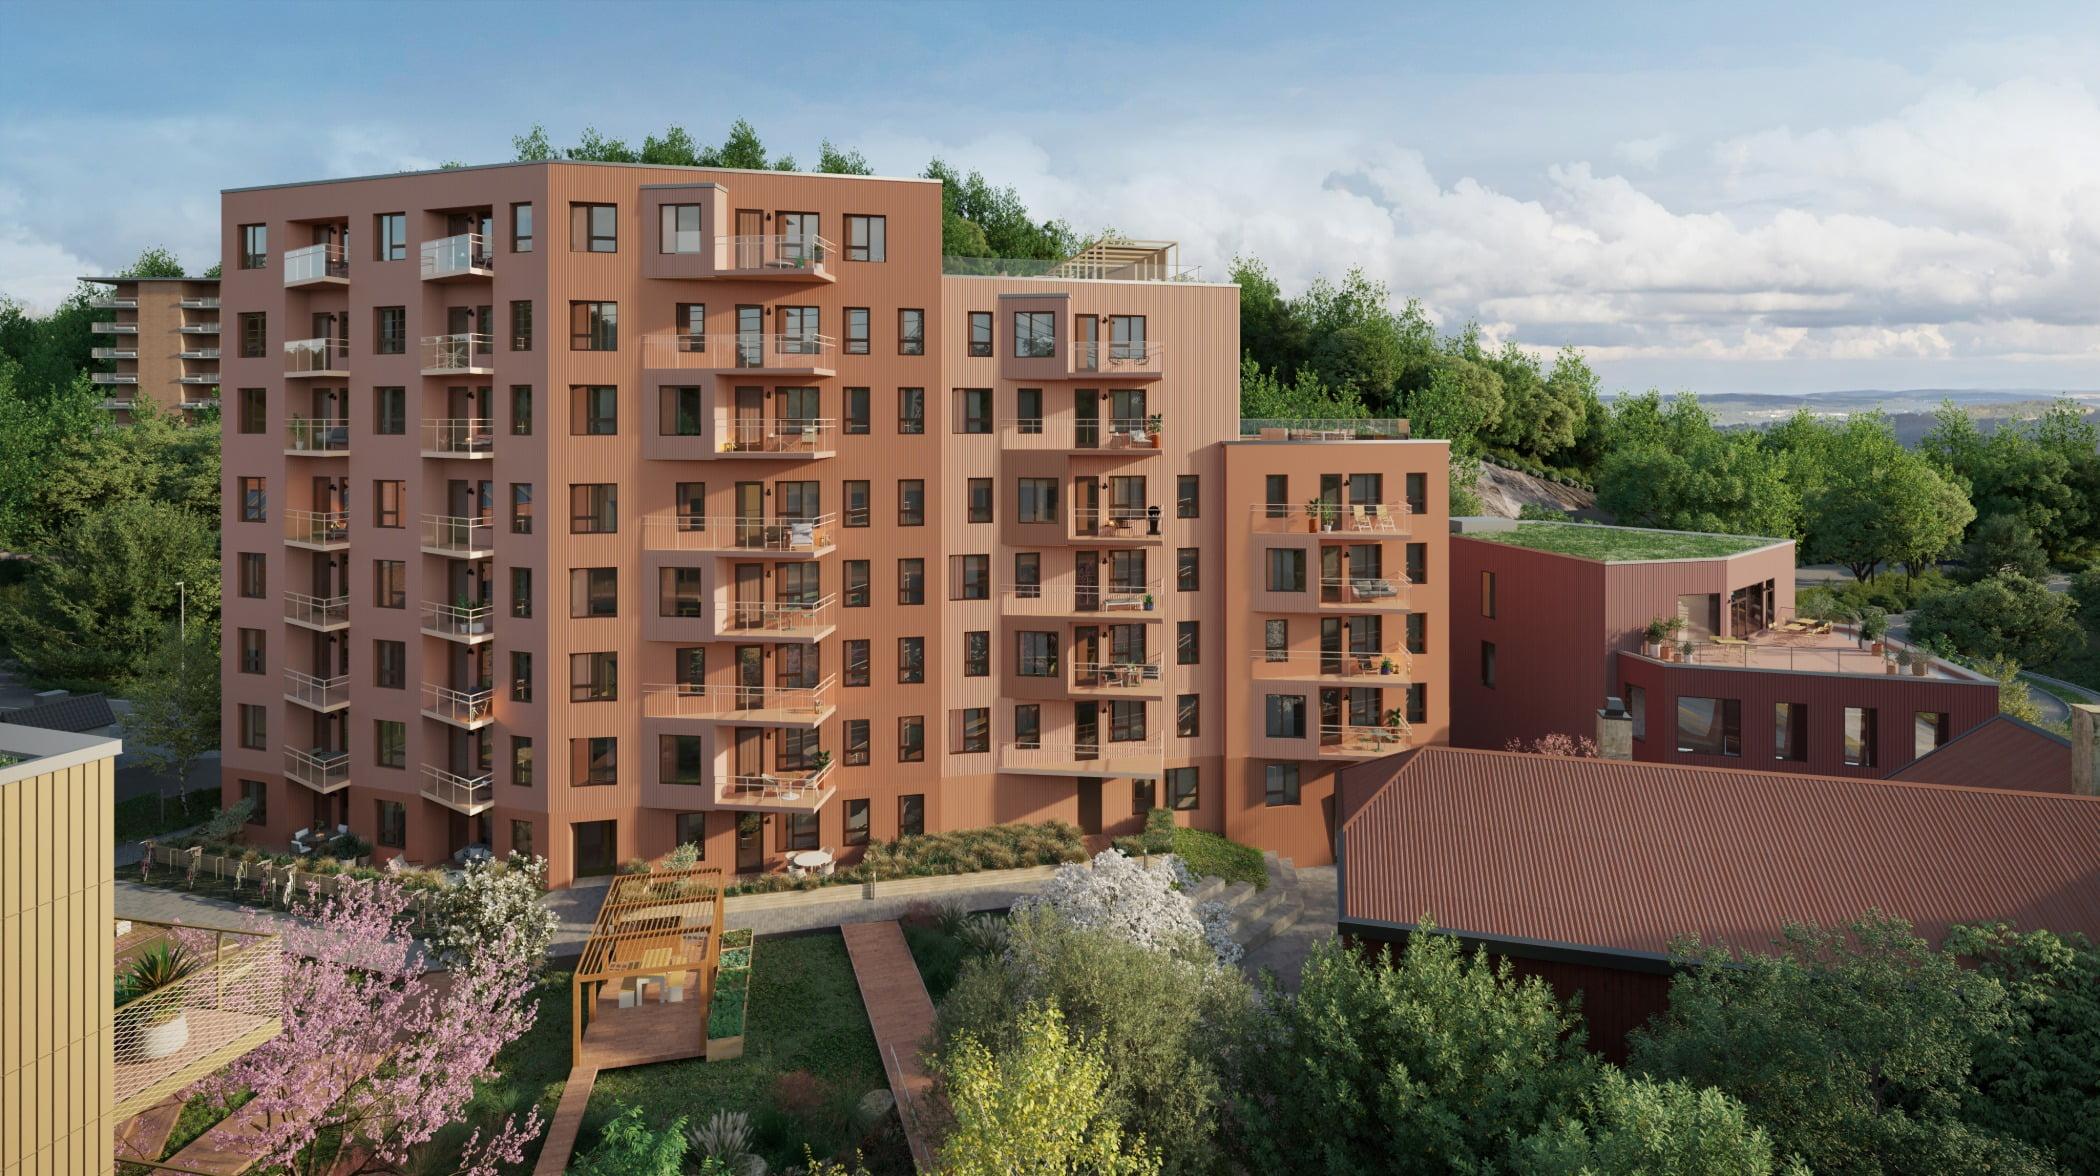 Tower block, Land lot, Cloud, Building, Sky, Plant, Tree, Window, Architecture, Vegetation